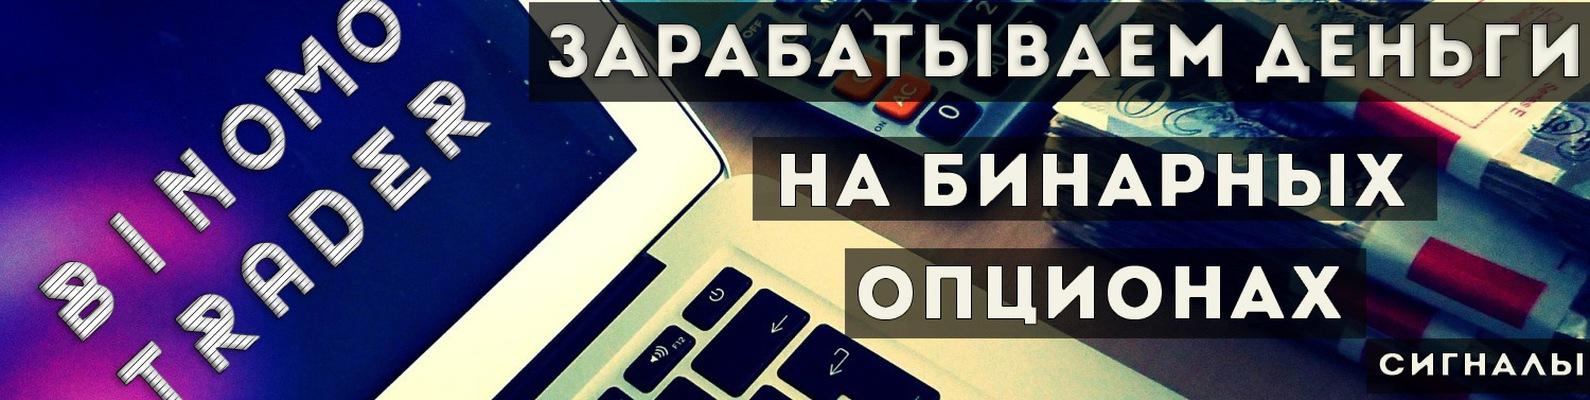 Заработок на бинарных опционах online заработок